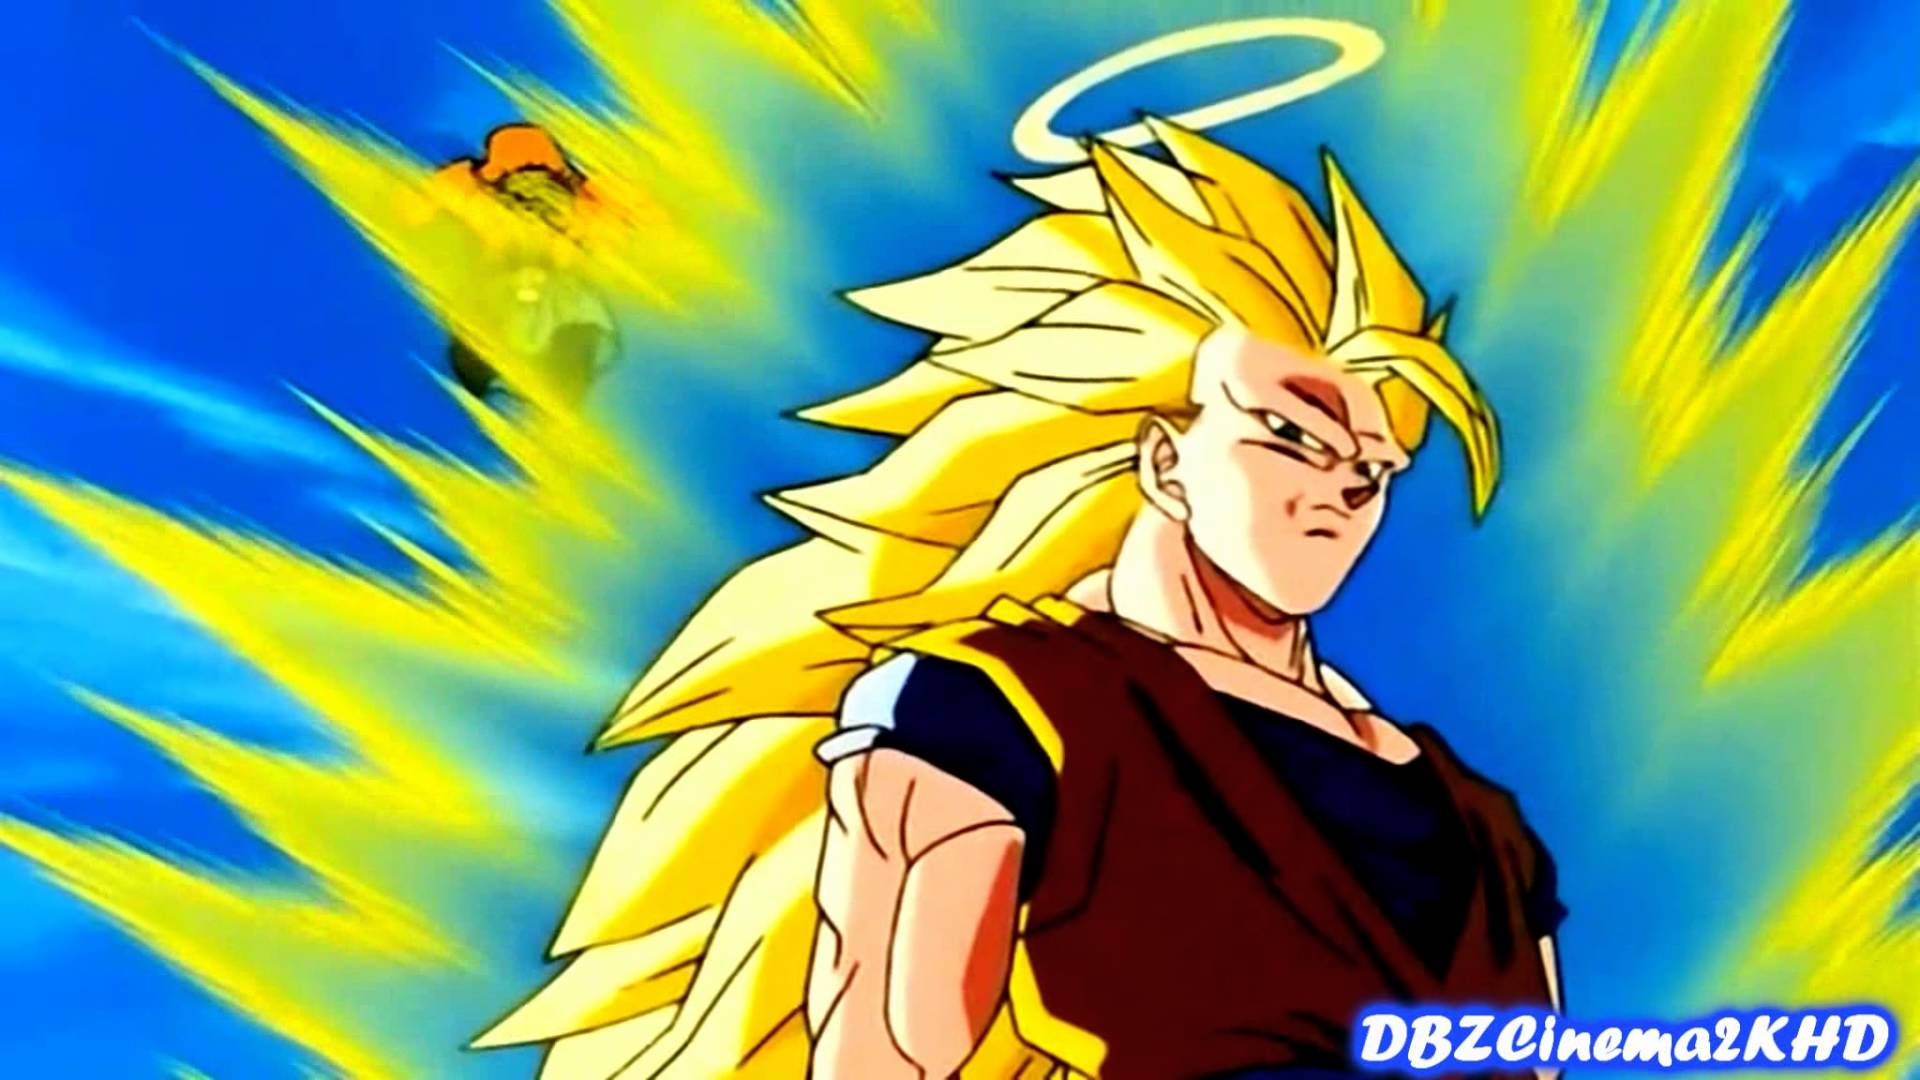 Goku   Dragon Ball Z Wallpaper 35368350 1920x1080